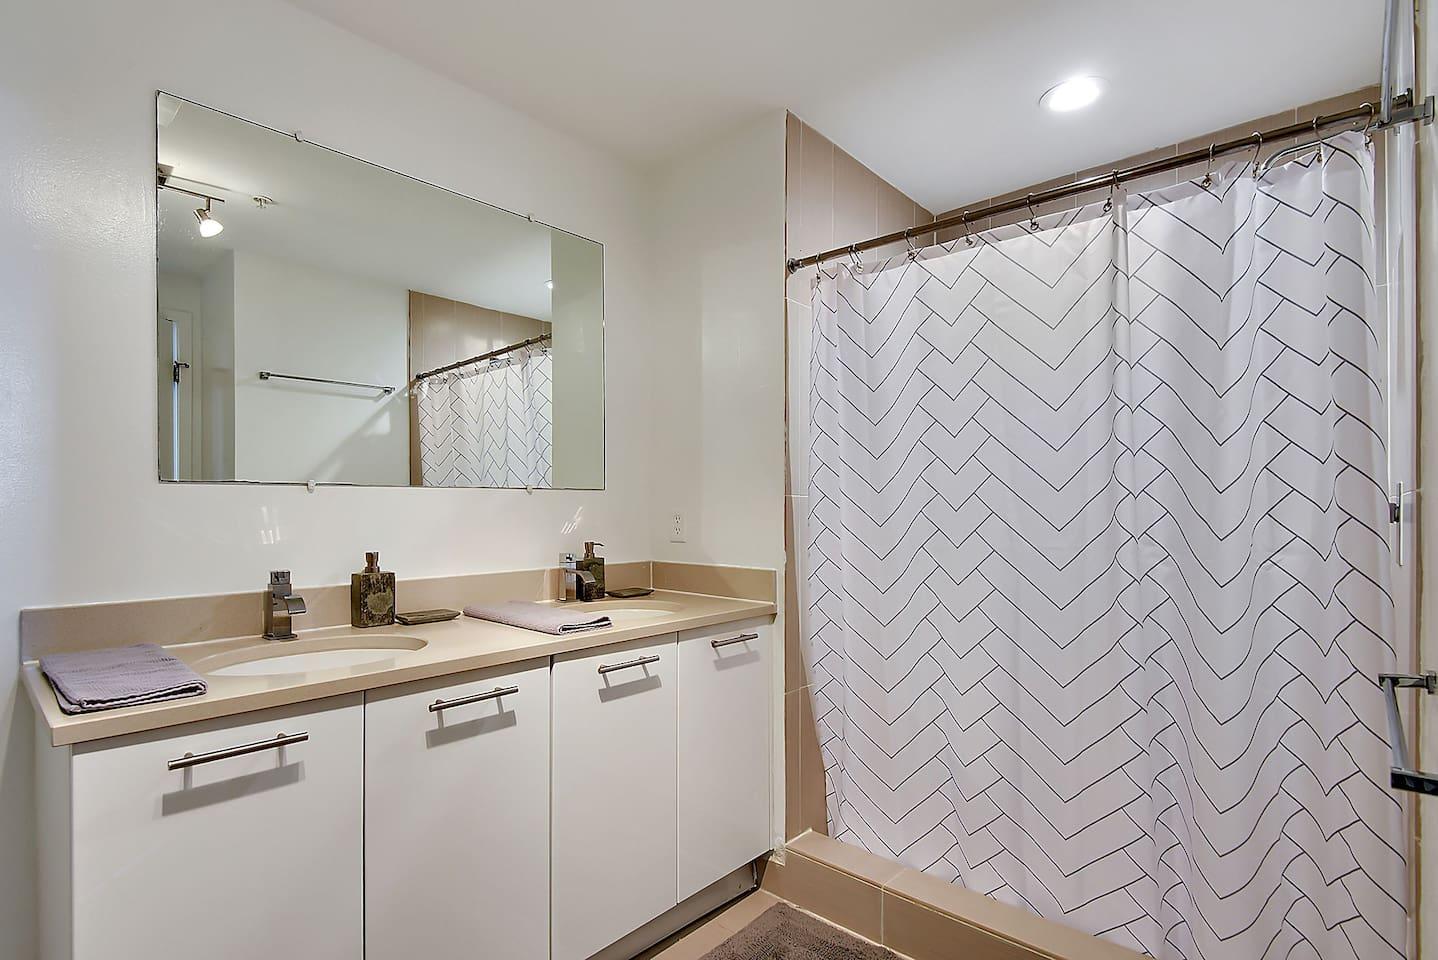 Luxury King suite, private bath in Midtown Parking